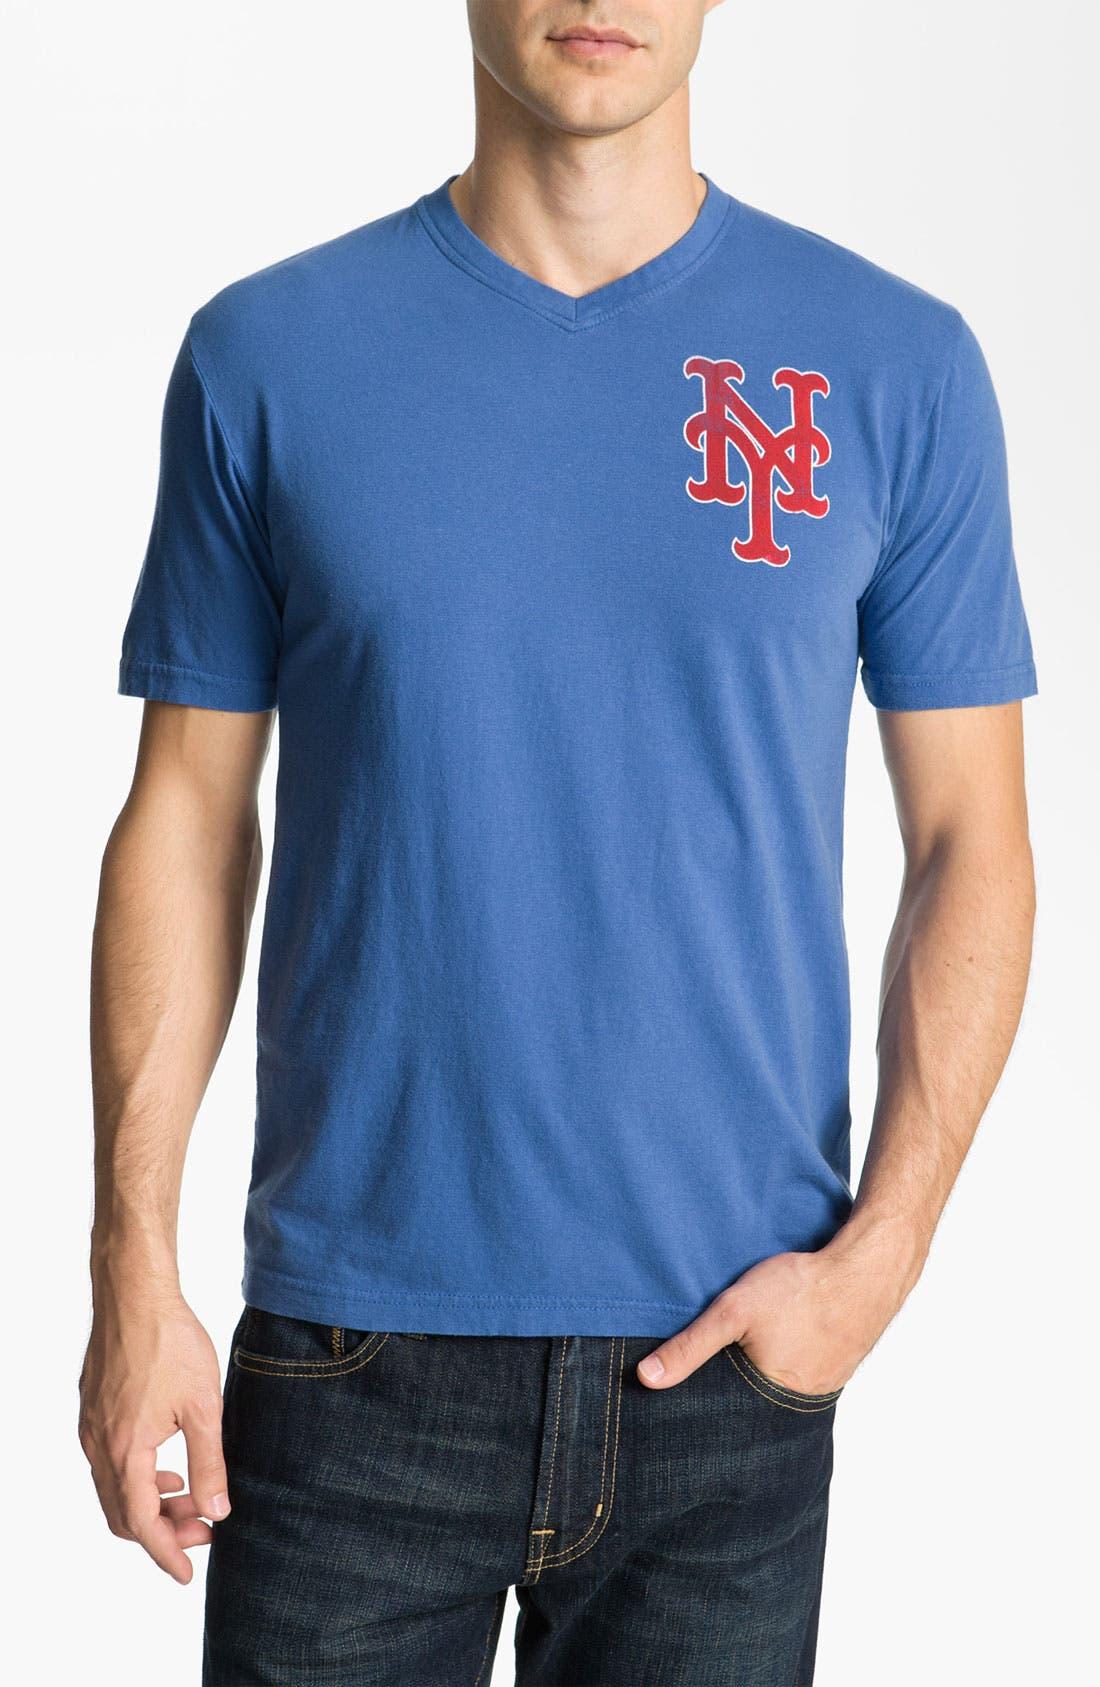 Alternate Image 1 Selected - Red Jacket 'Mets - Huron' T-Shirt